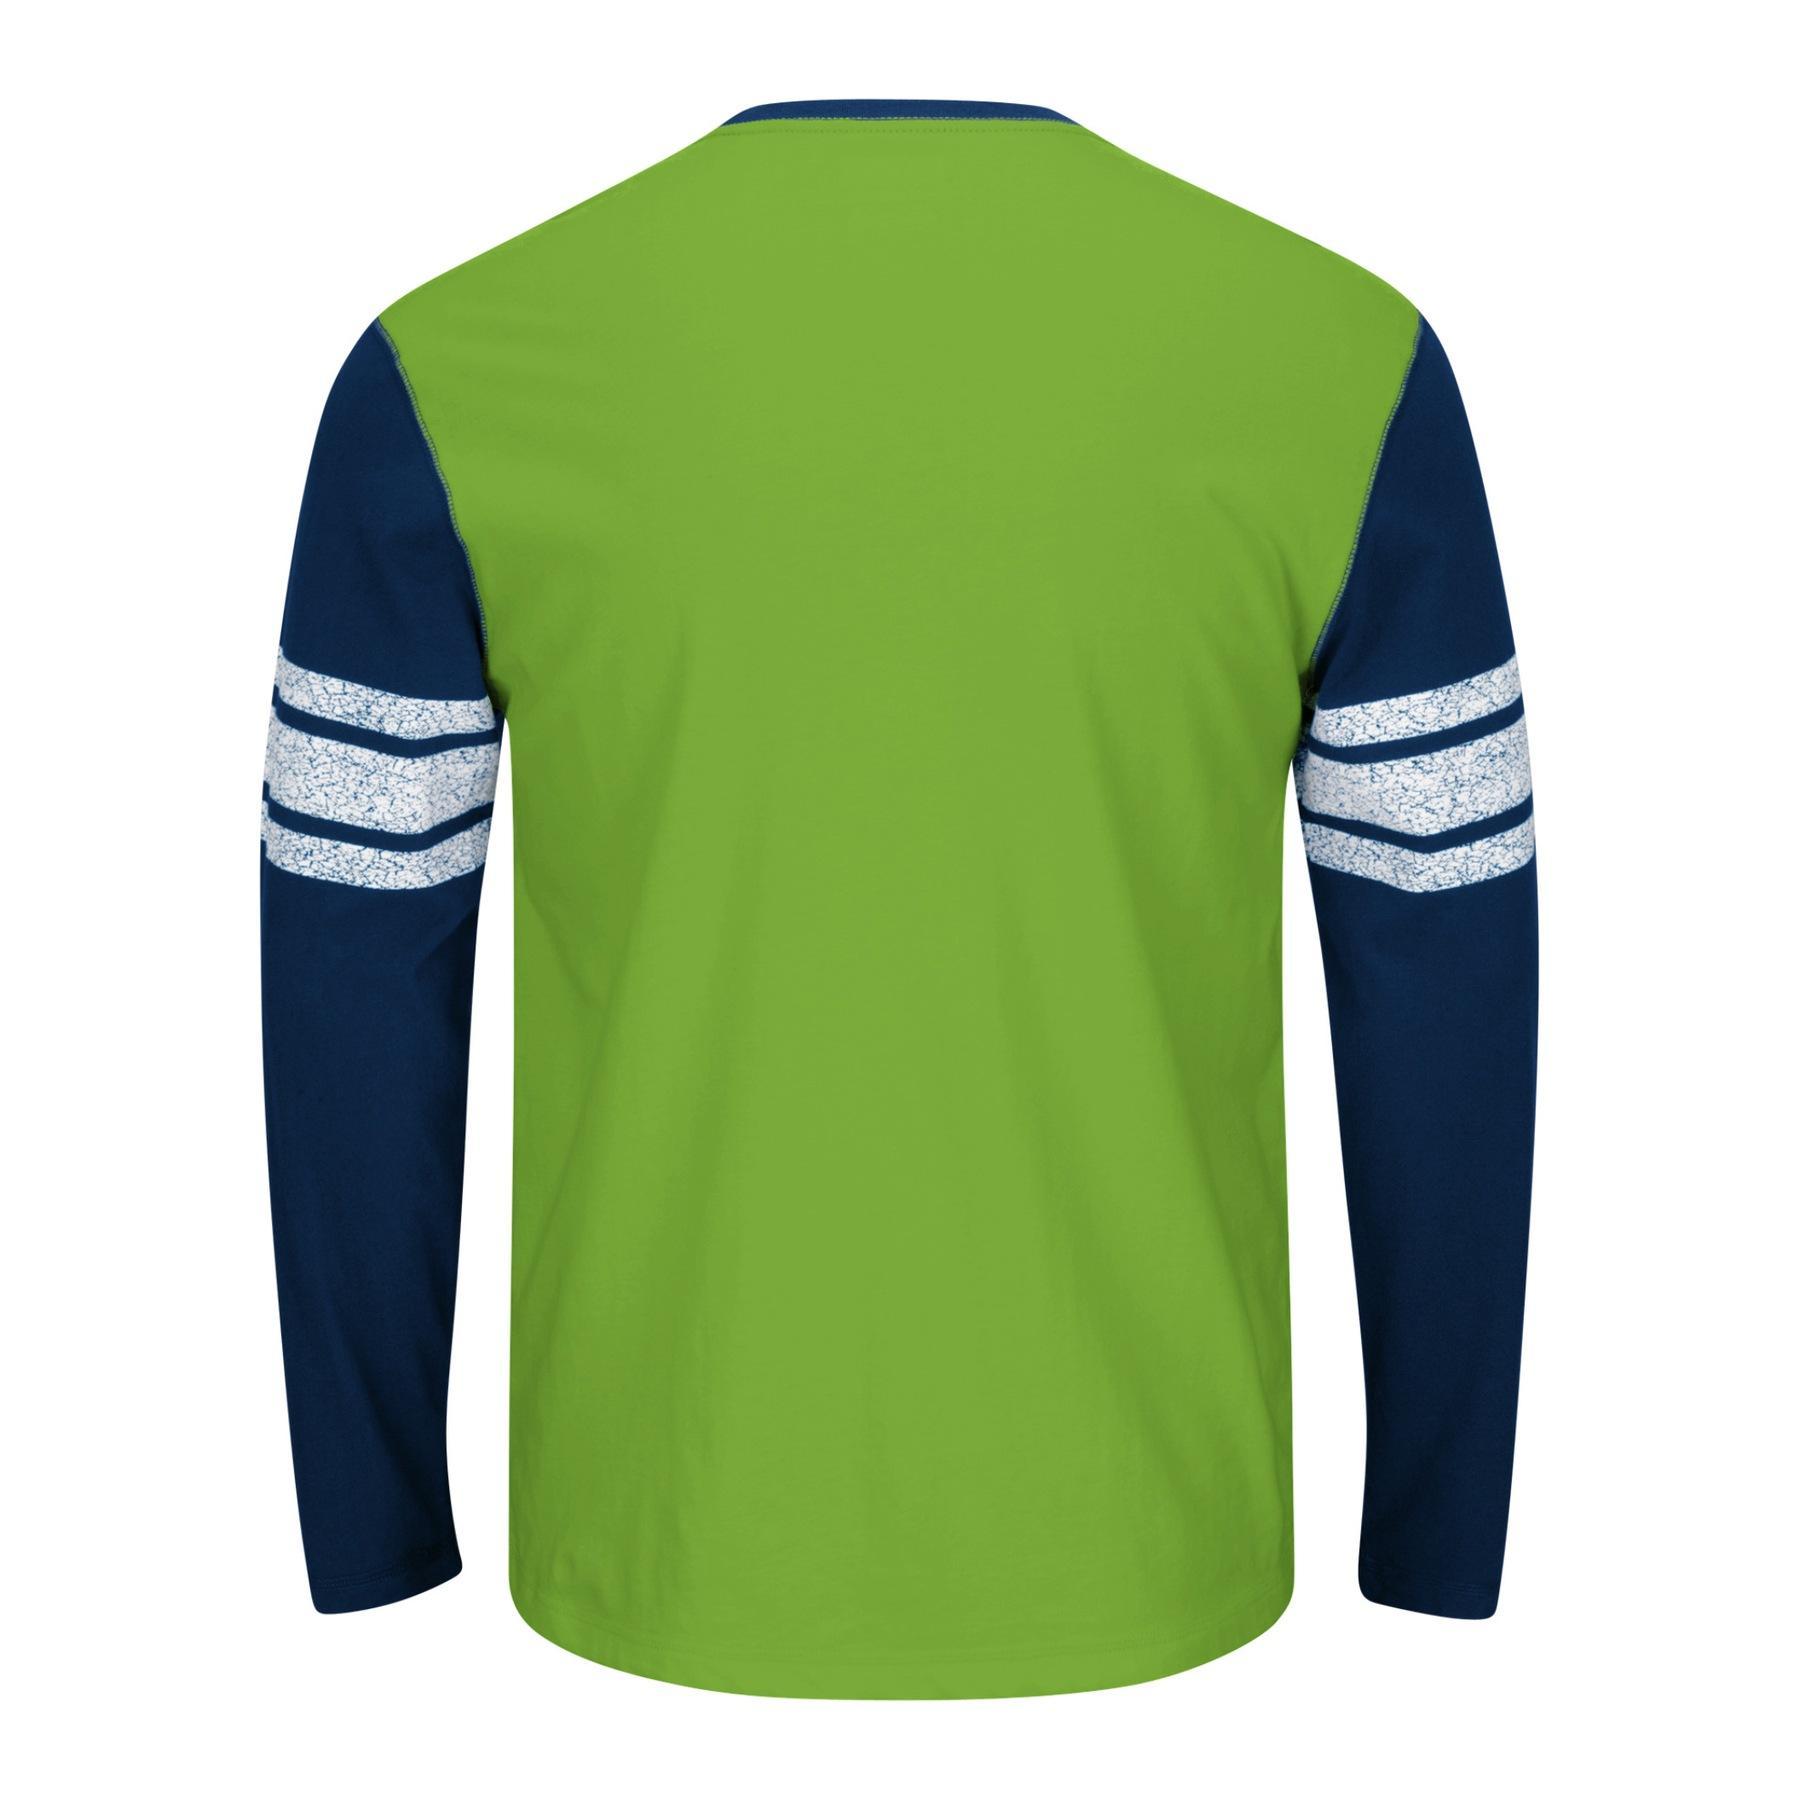 NFL Men's Raglan Shirt - Seattle Seahawks